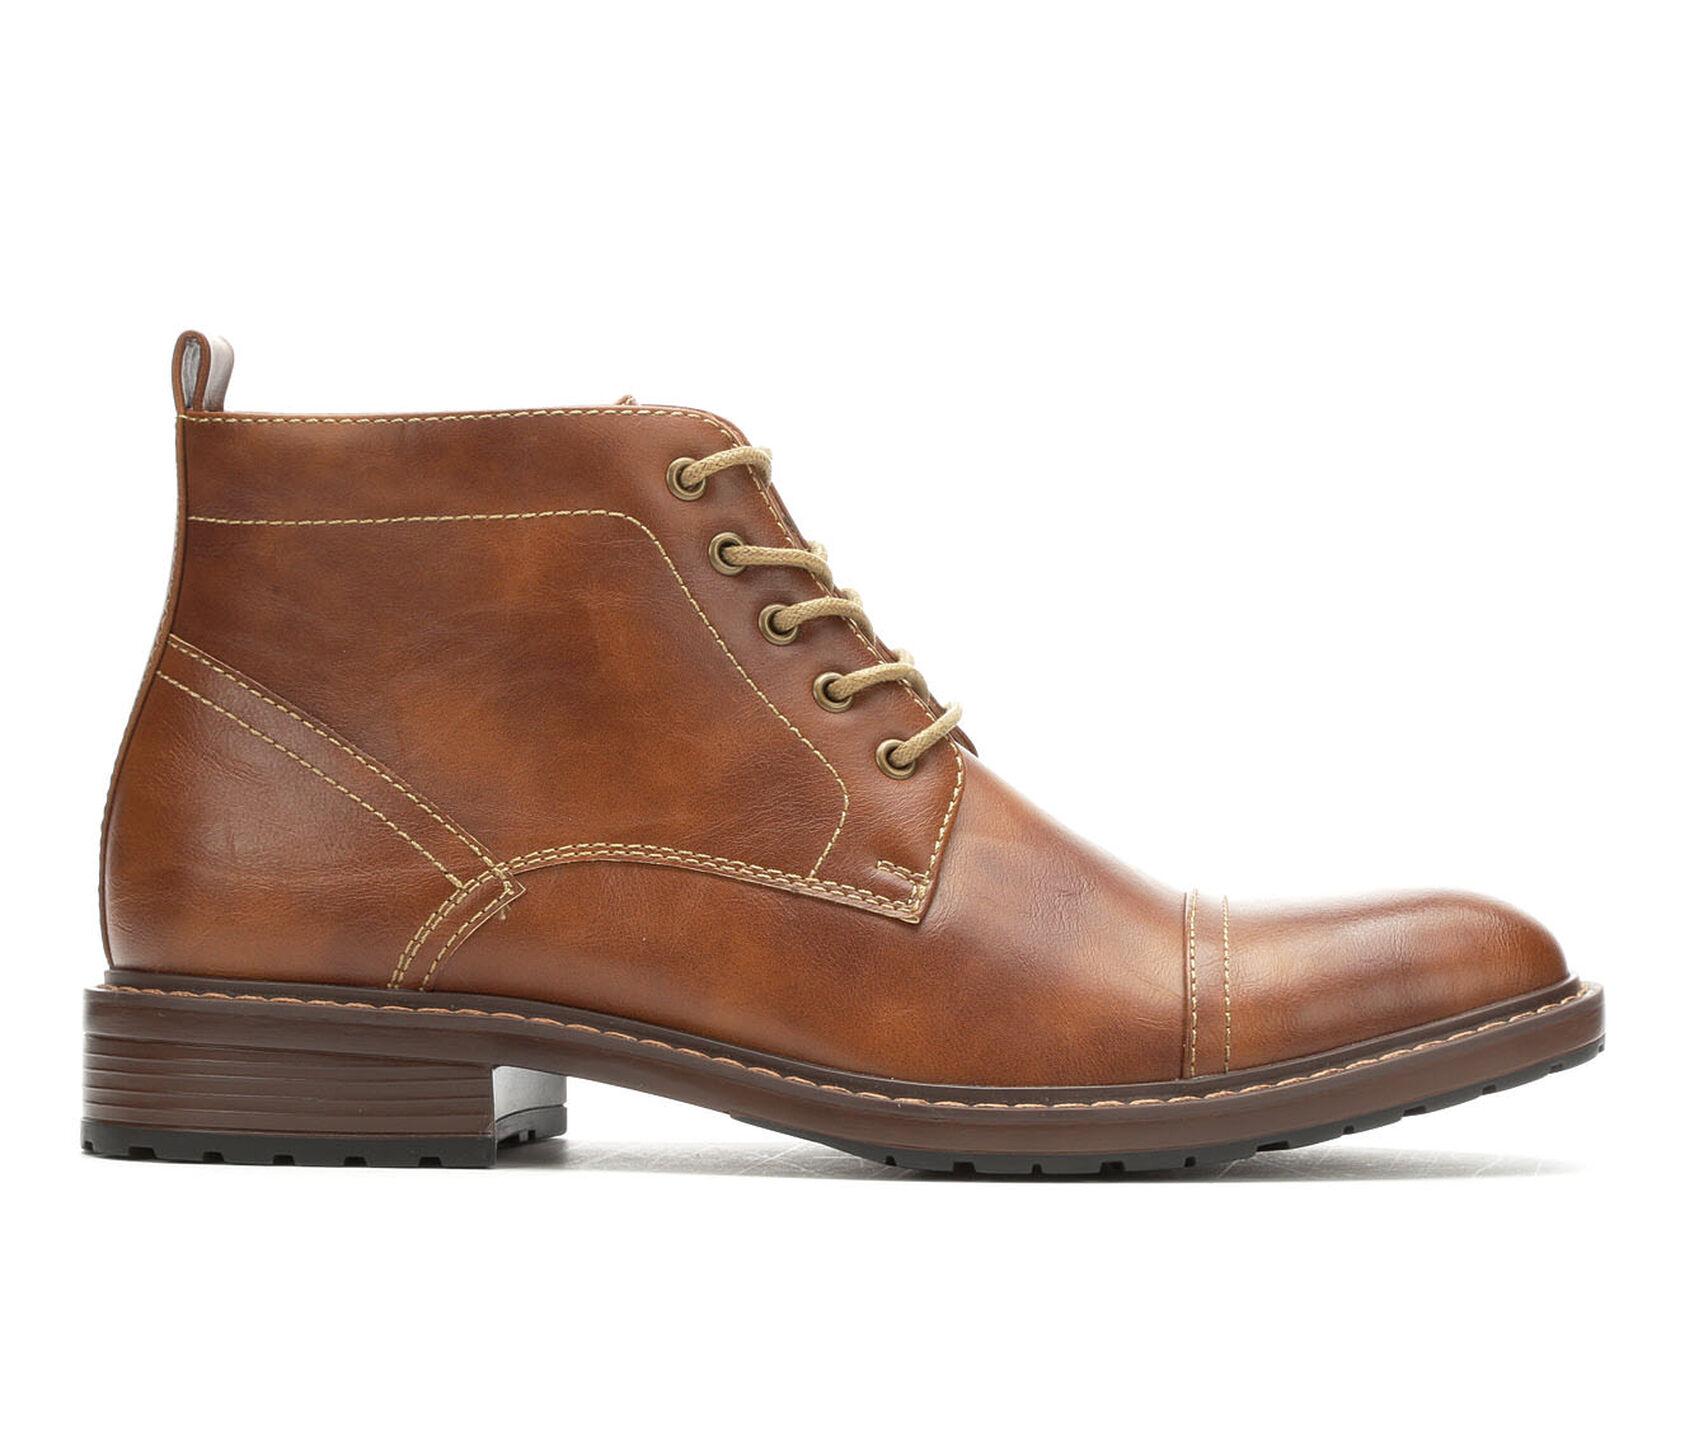 7d68f064b614 Men s Perry Ellis Manning Boots